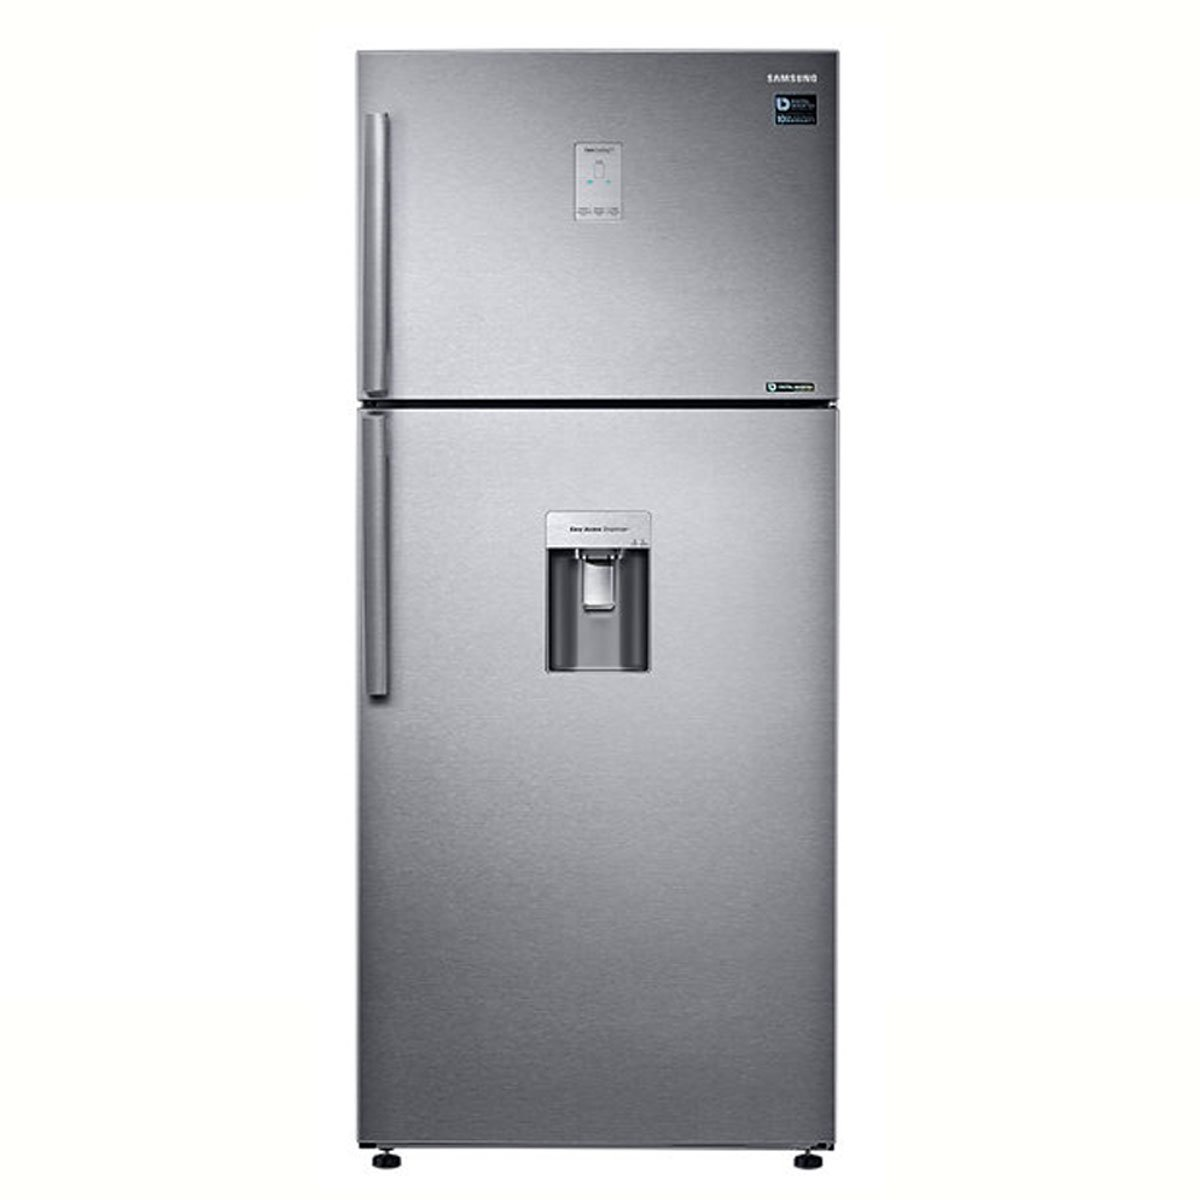 refrigerador samsung top mount 19 pies easy clean steel. Black Bedroom Furniture Sets. Home Design Ideas